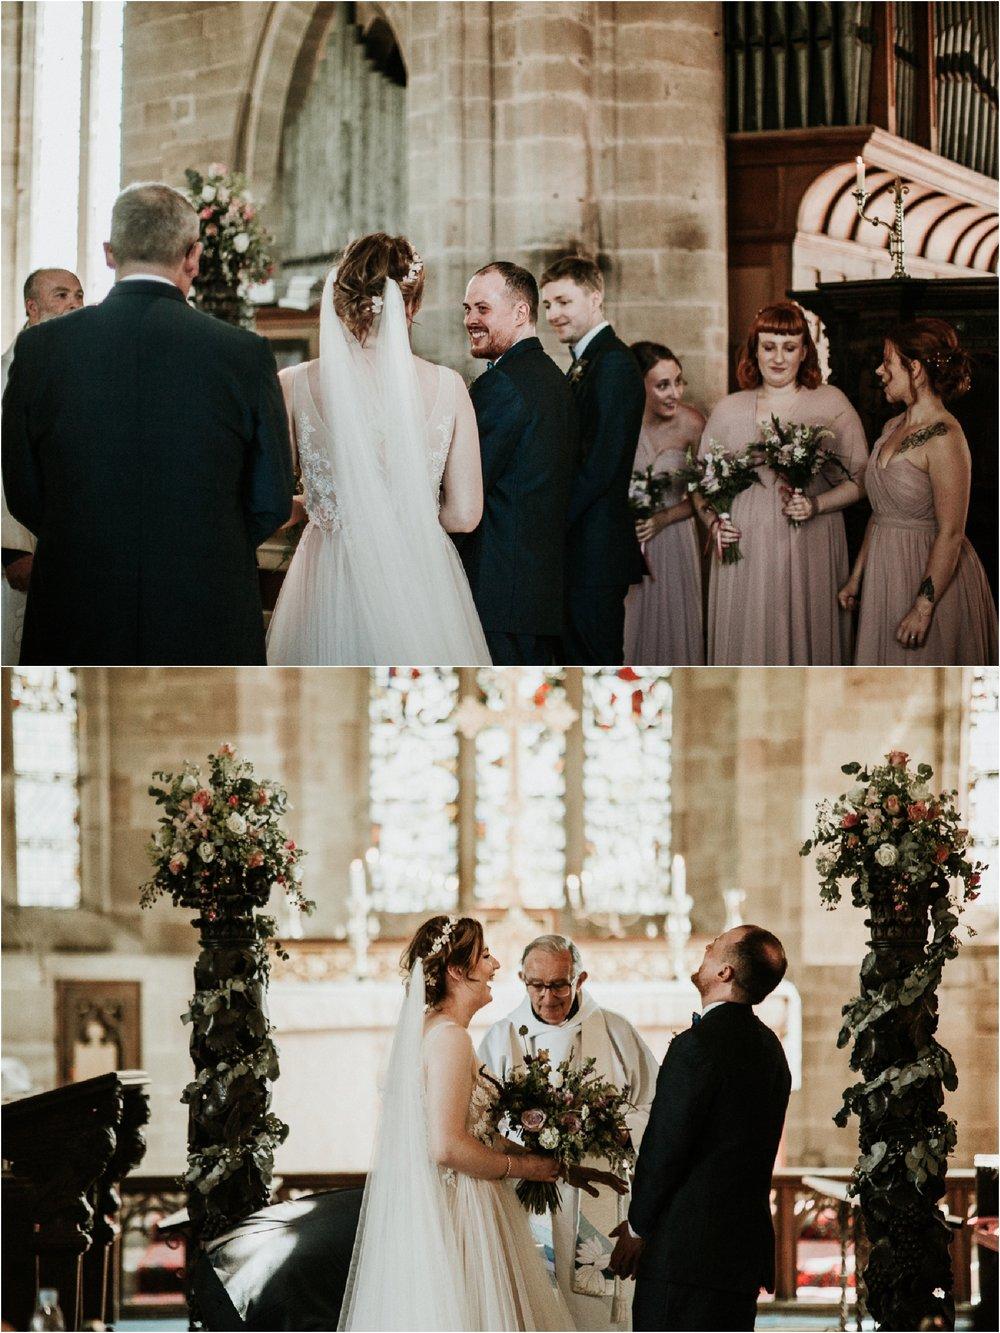 Herefordshire-uk-wedding-photographer_0047.jpg